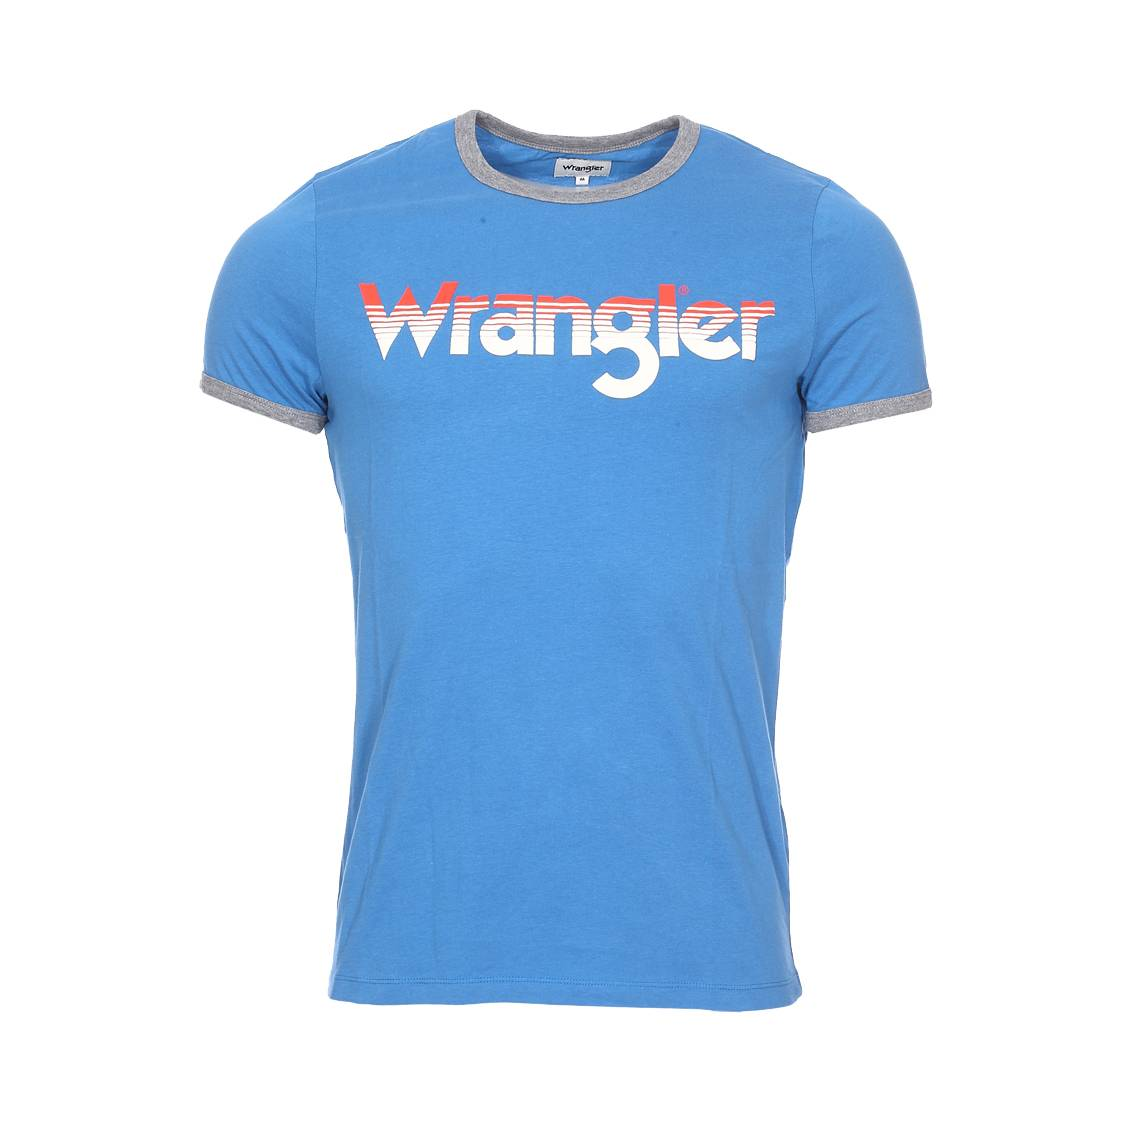 Tee-shirt col rond  logo ringer en coton bleu roi floqué en blanc et orange